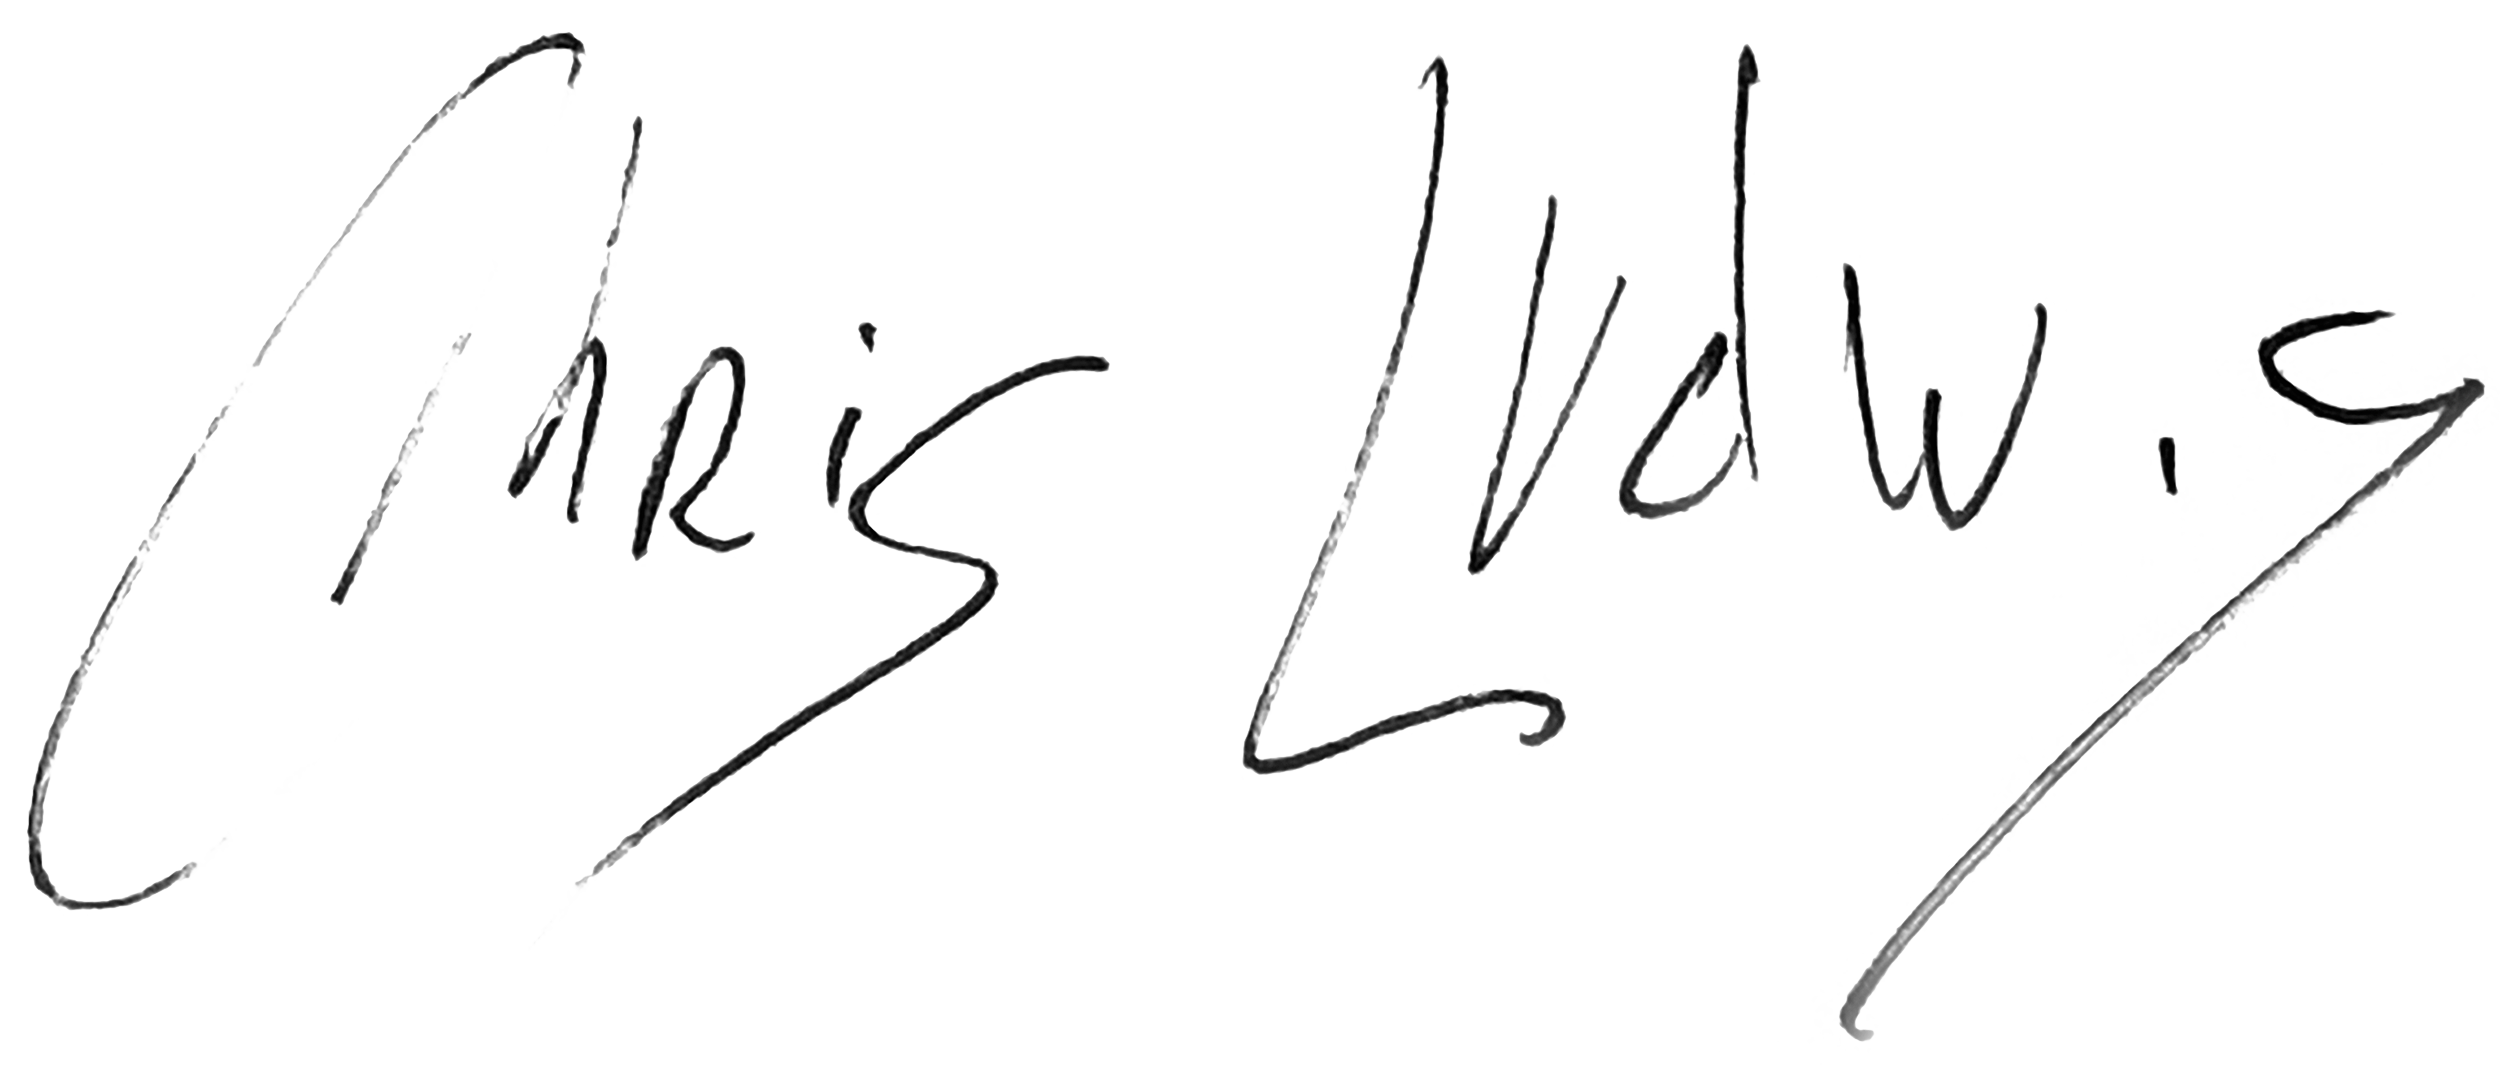 Chris ludwig's Signature